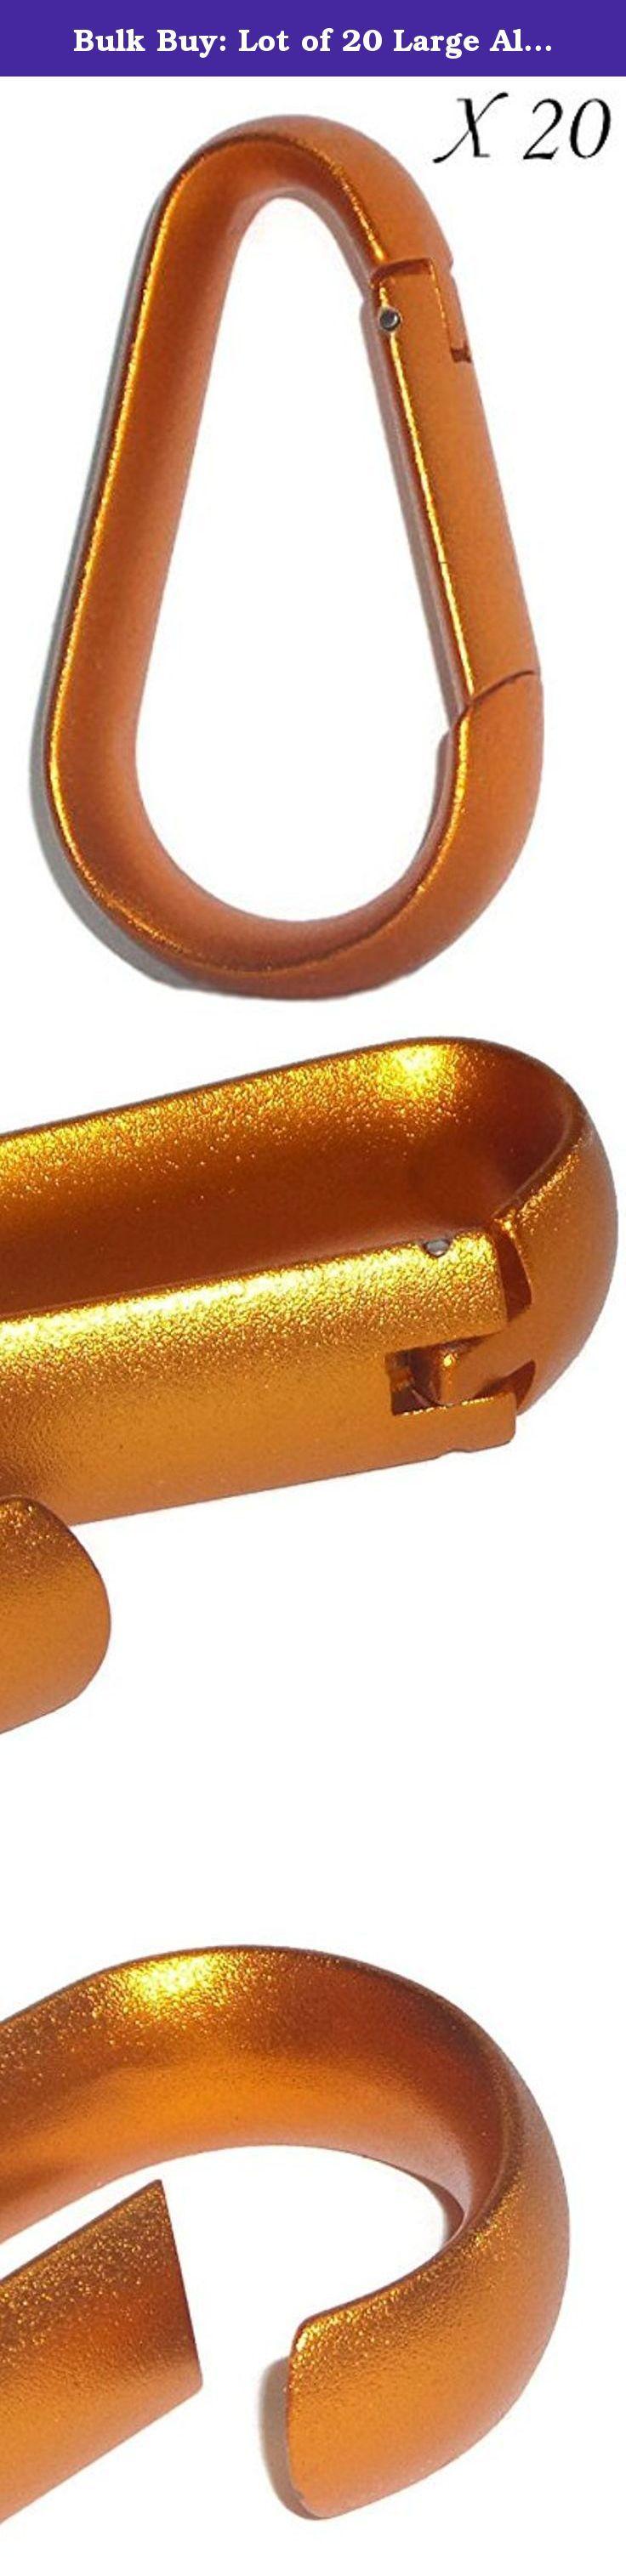 Bulk Buy: Lot of 20 Large Aluminum Non-Load Bearing Metallic Orange Carabiners. Price is for 1 case of 20 carabiners - color is a metallic orange.